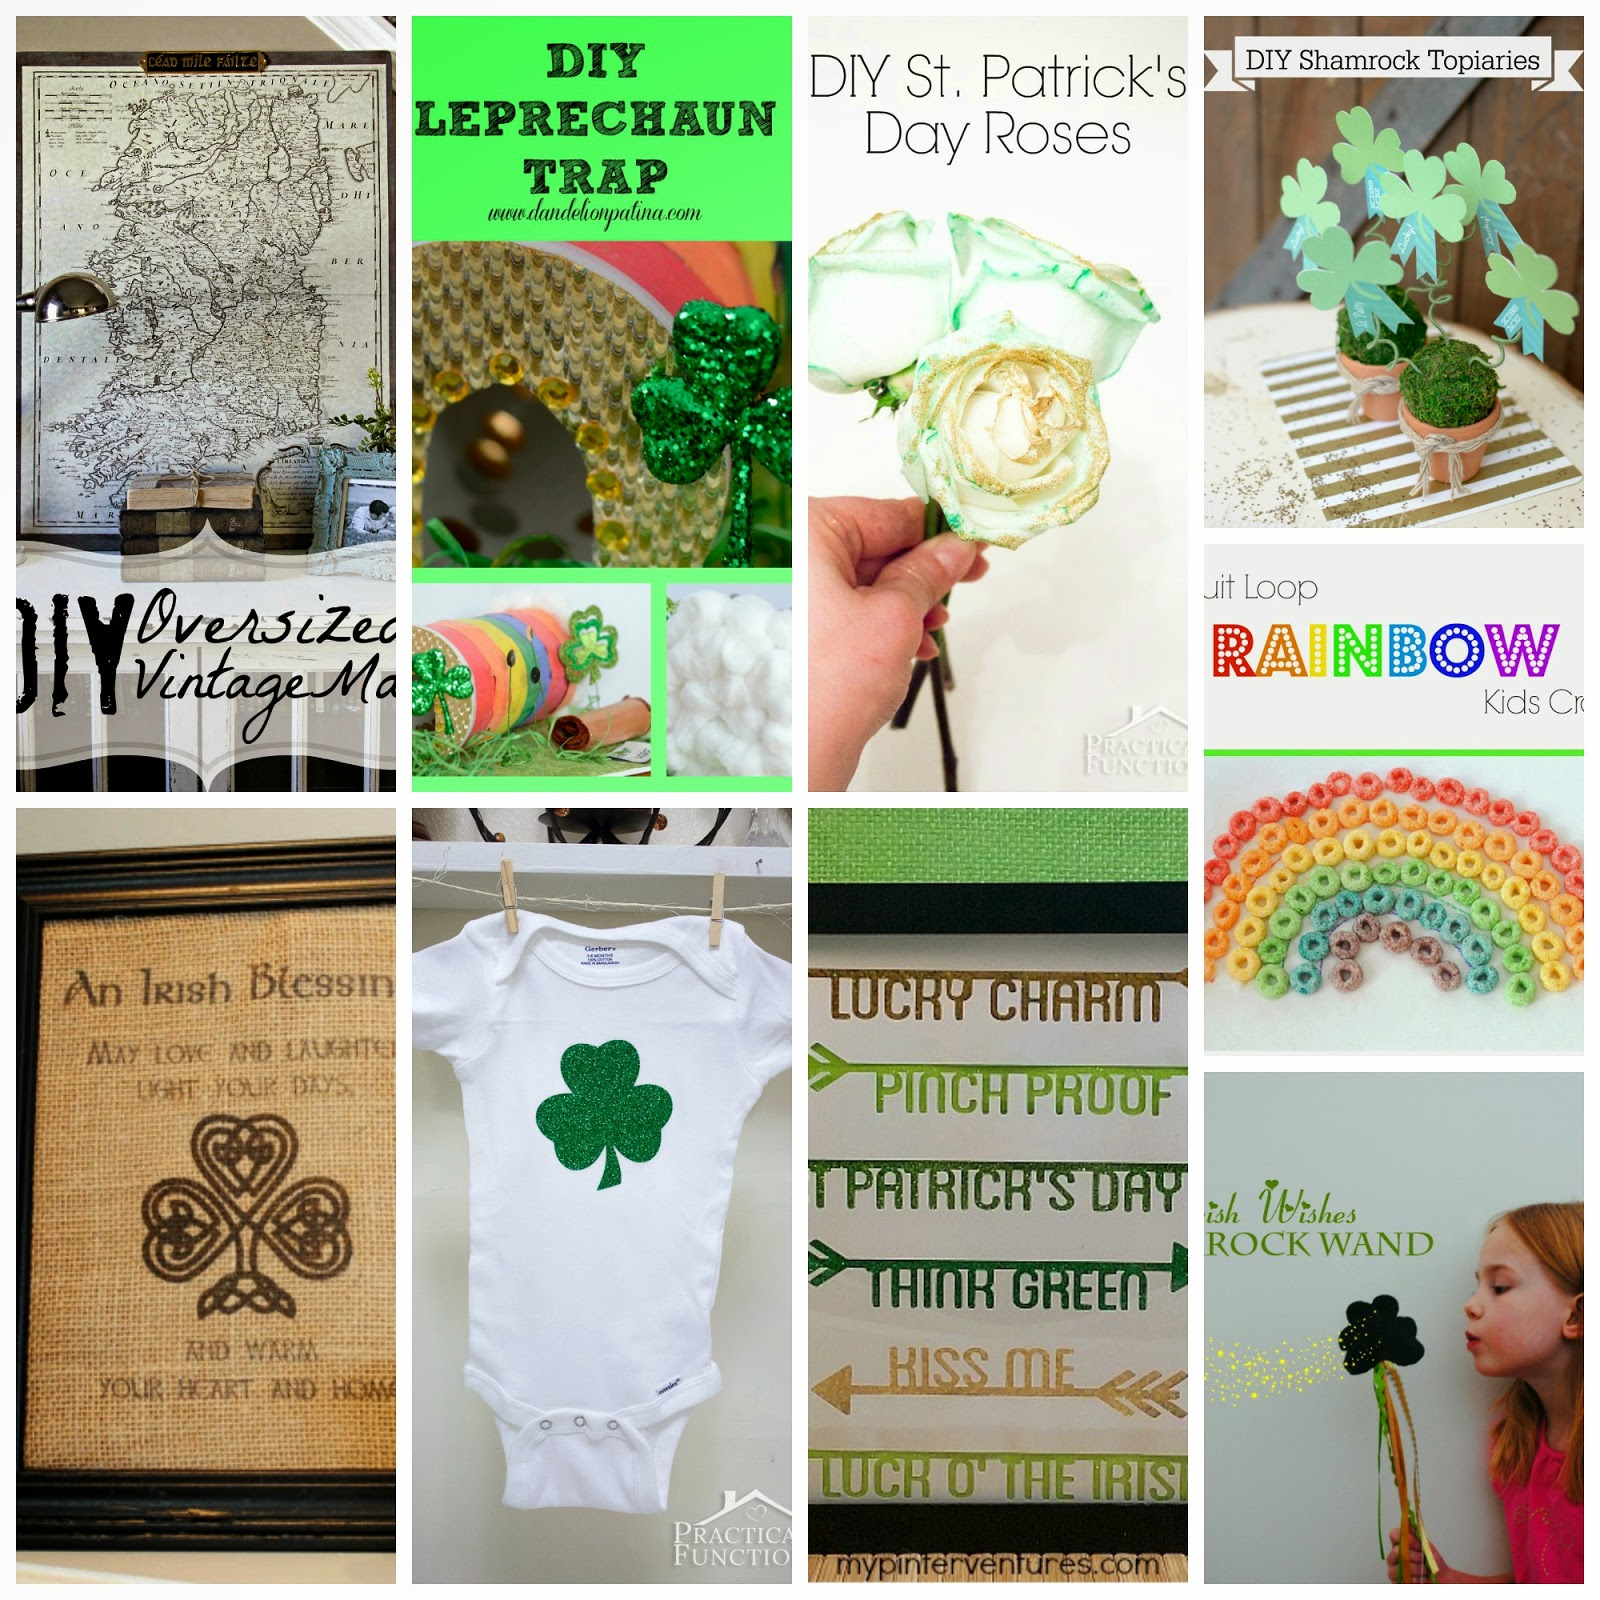 10 Super Awesome St. Patrick's Day Inspired Crafts #diy #stpatricksday